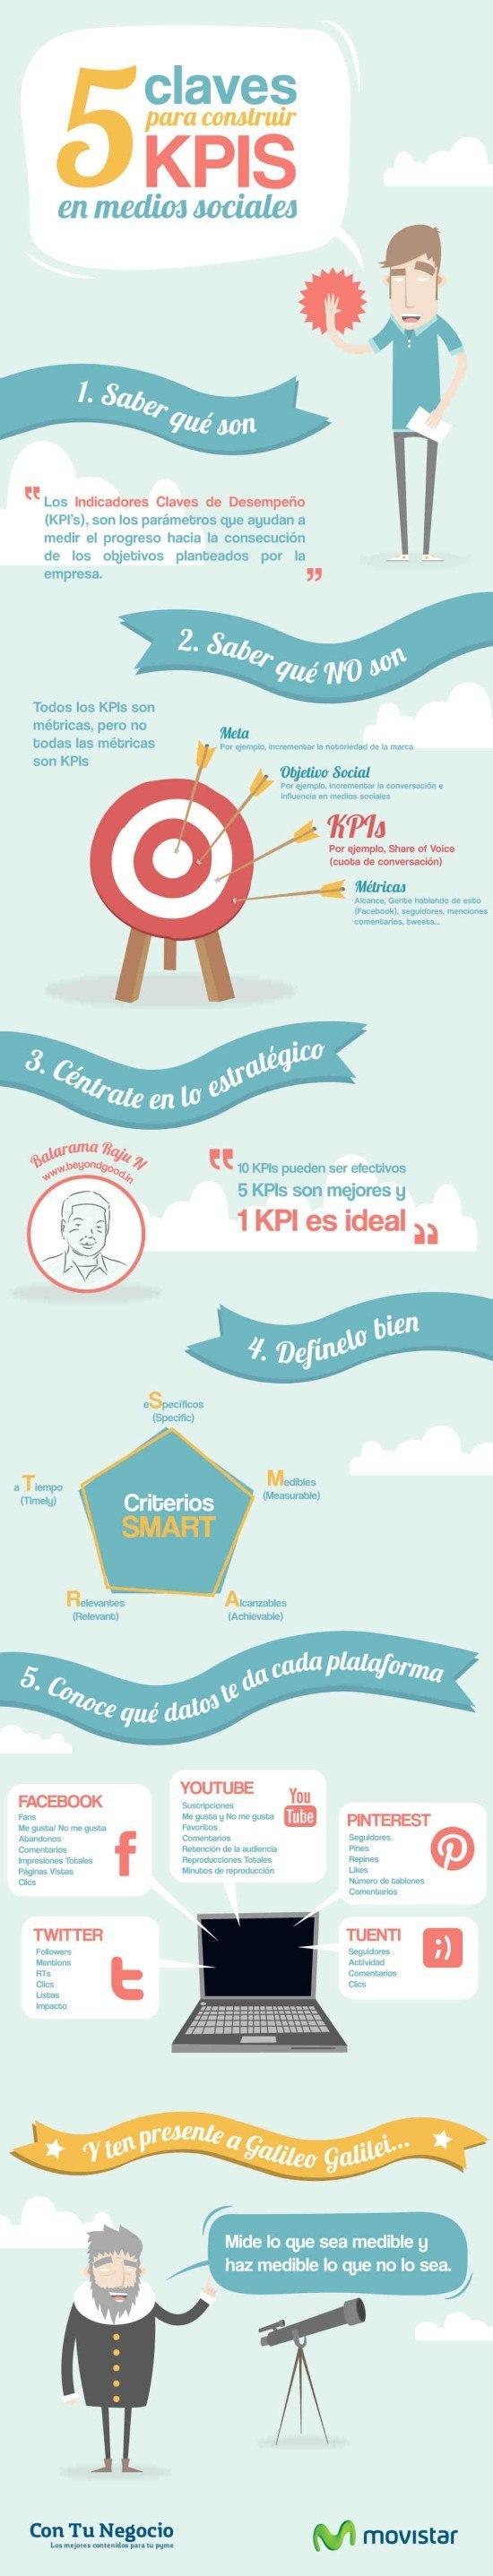 Claves para construir KPIS en redes sociales #Infografía